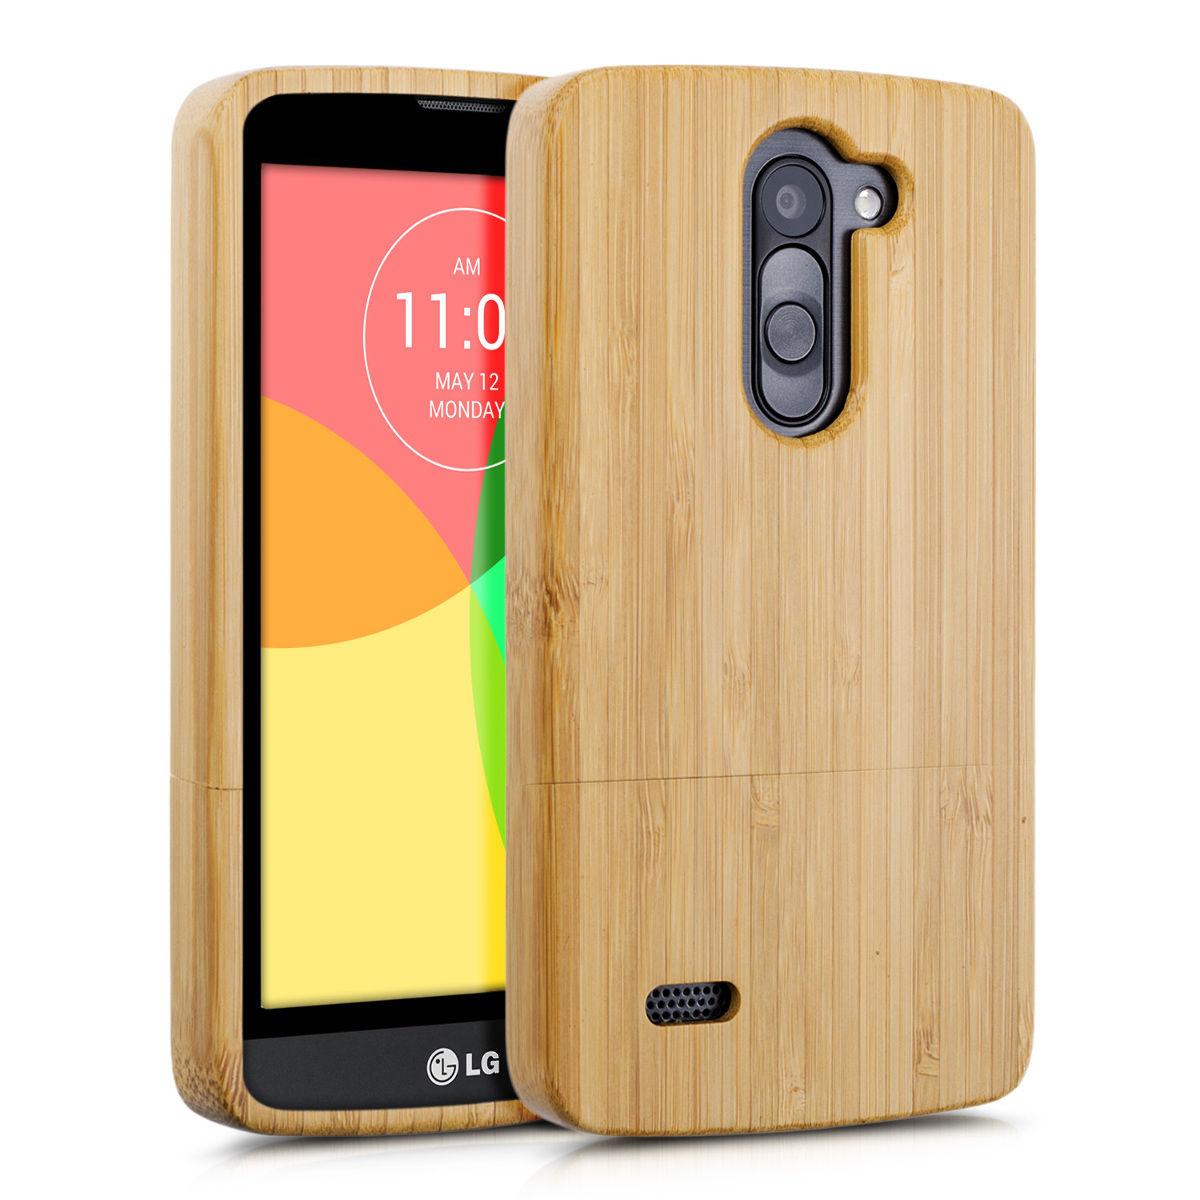 Pouzdro pro LG L BELLO bambus